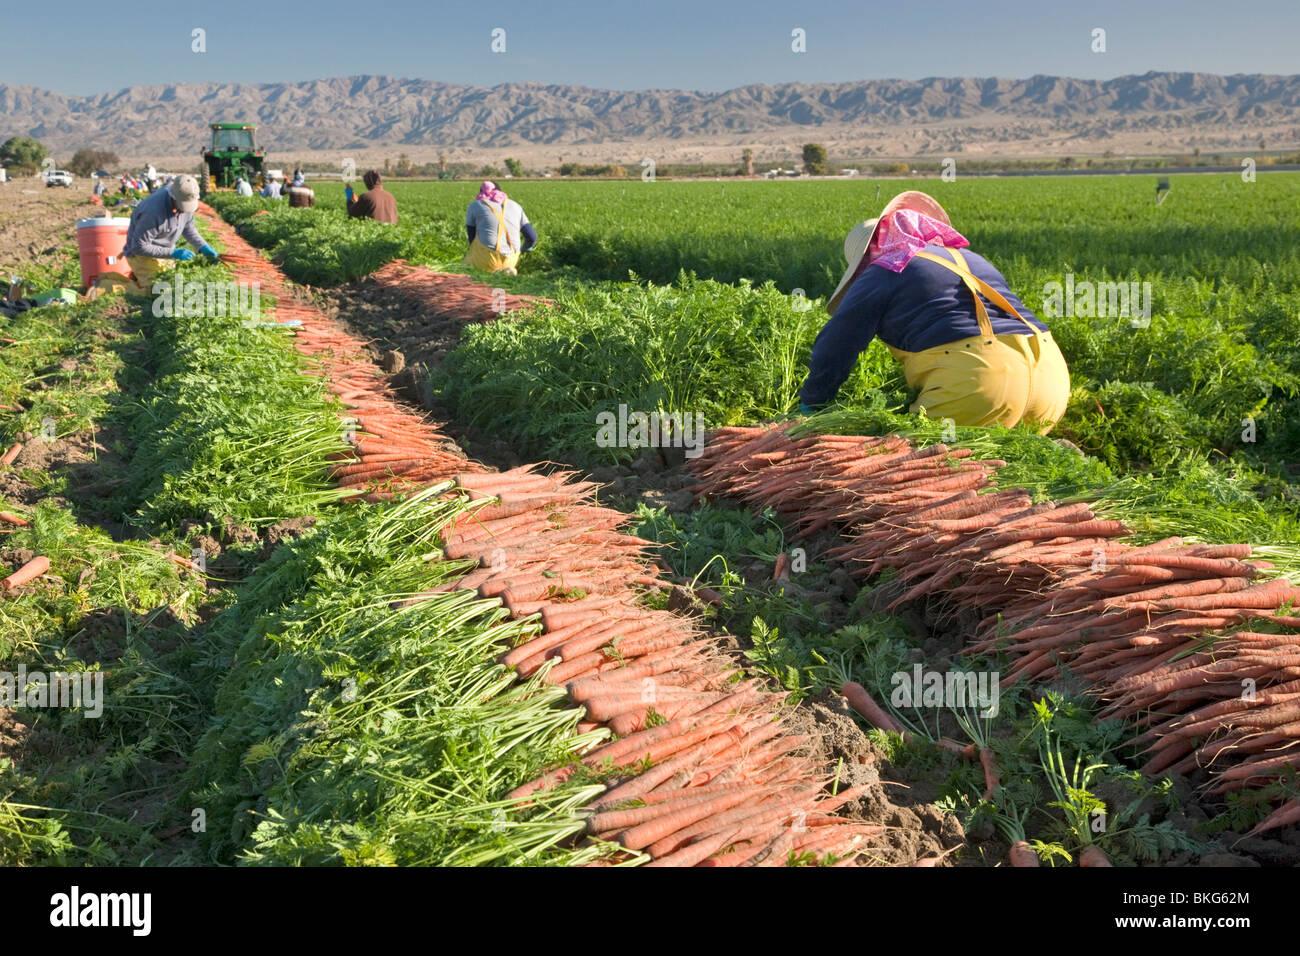 """Zanahoria aucus carota"" cosecha, levantamiento de trabajadores. Imagen De Stock"